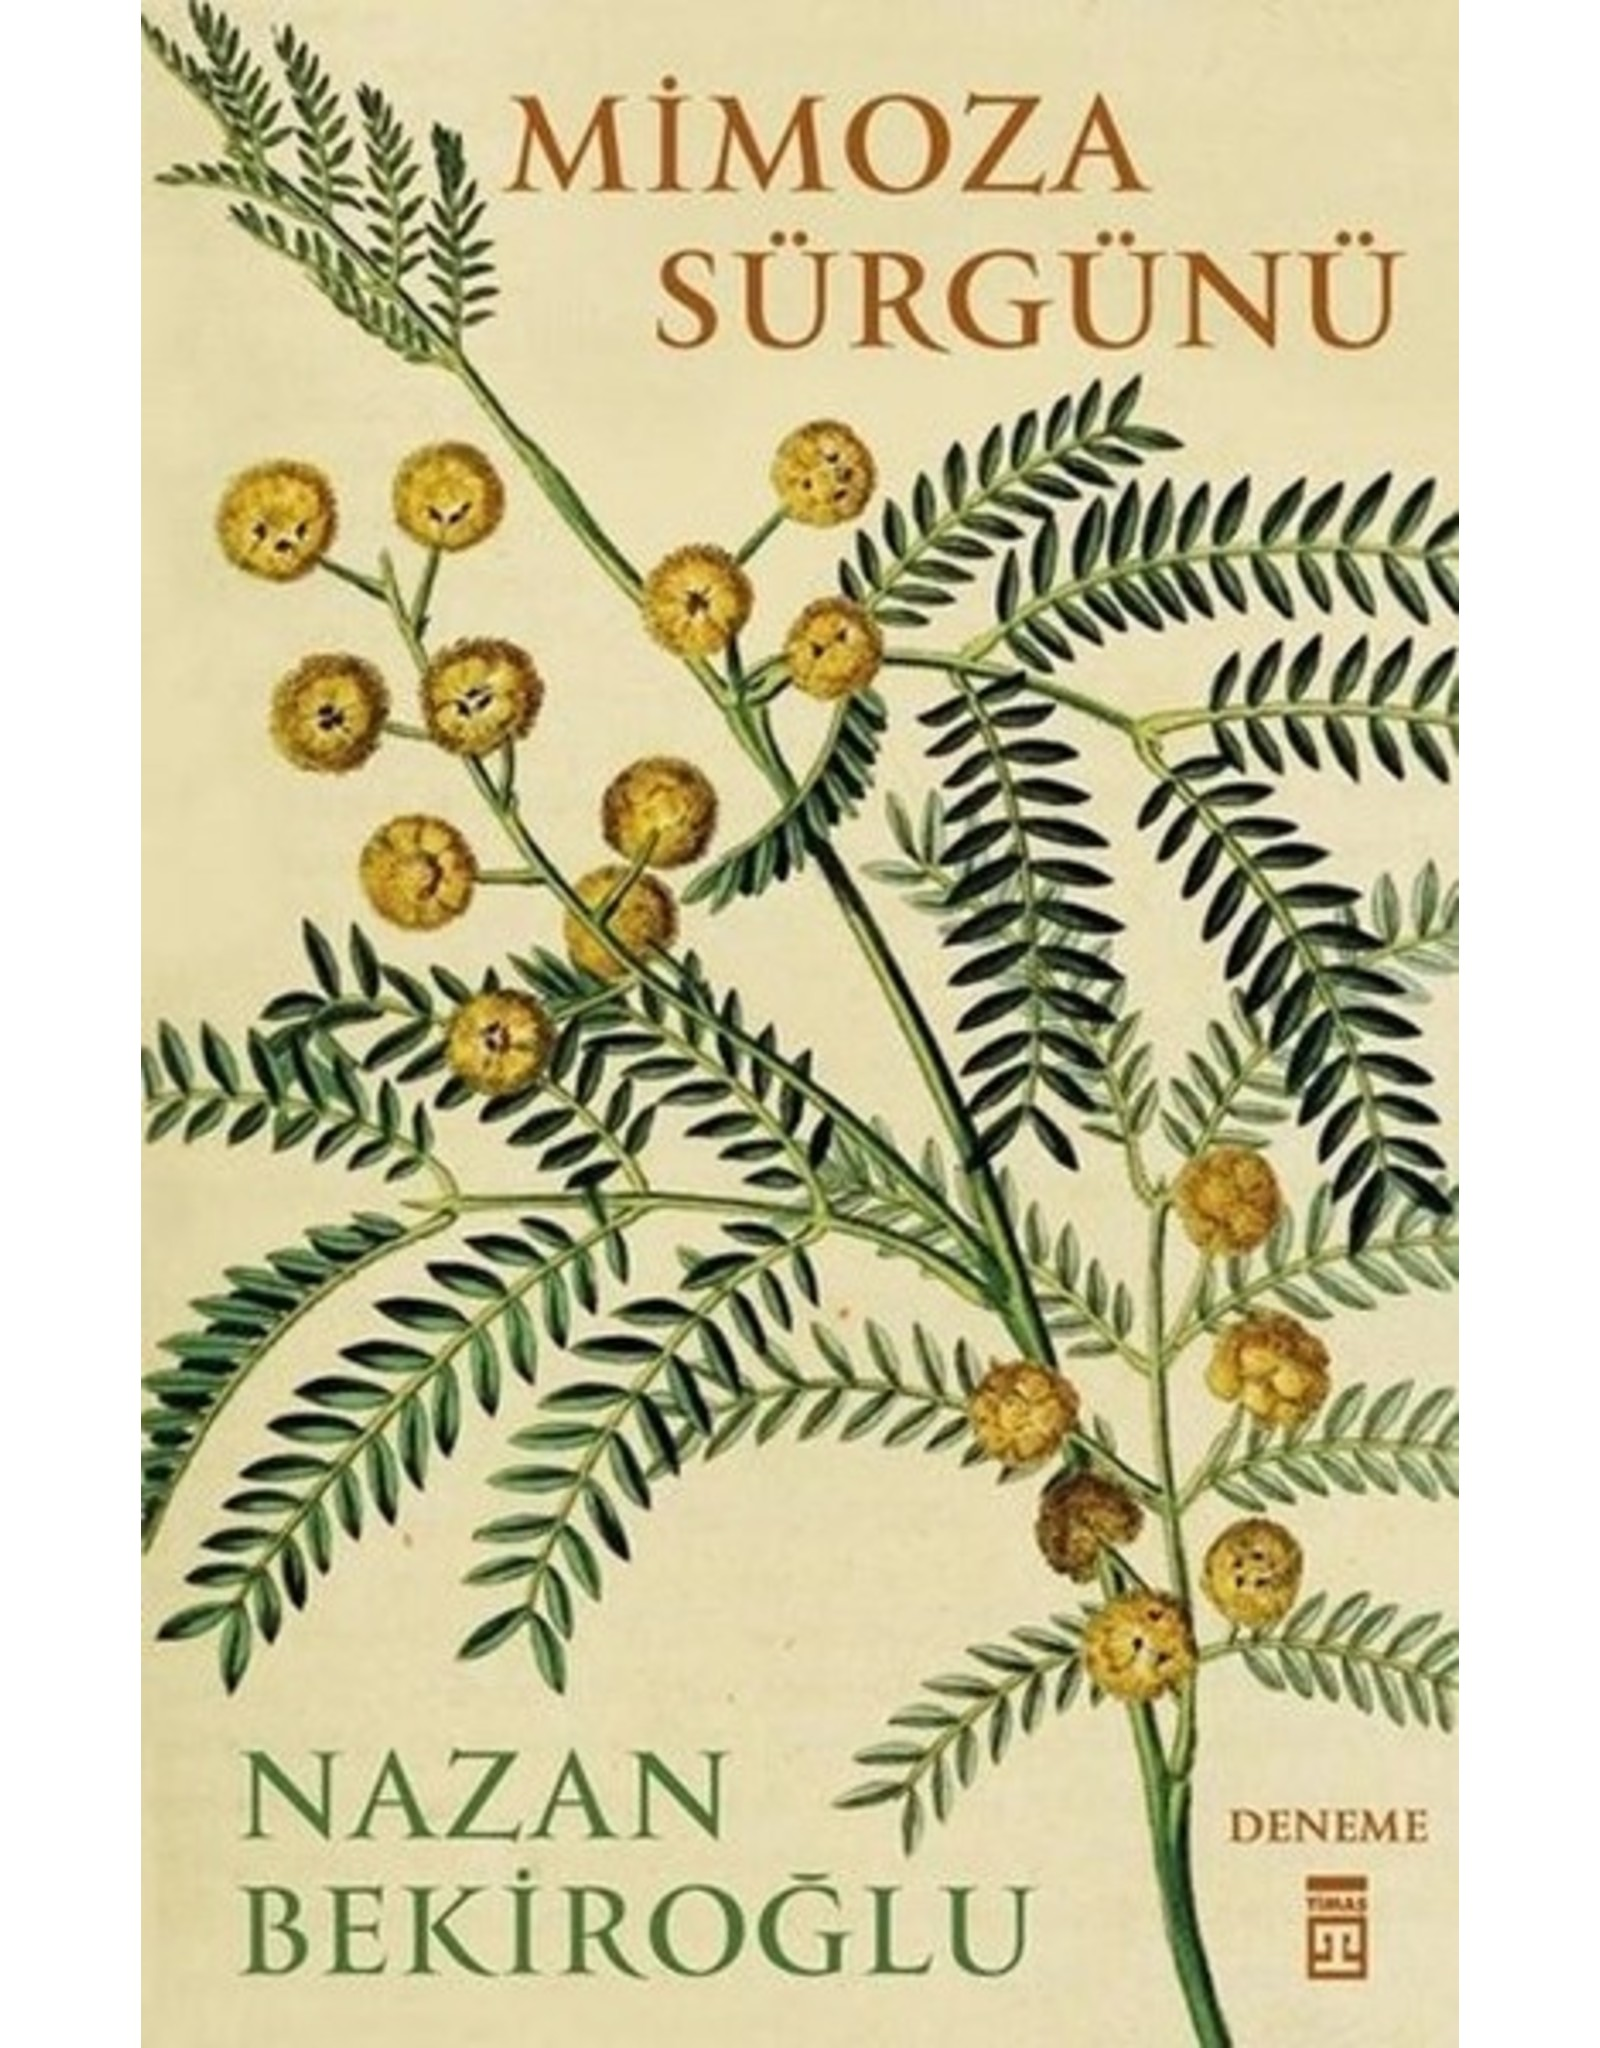 Nazan Bekiroğlu Mimoza Sürgünü